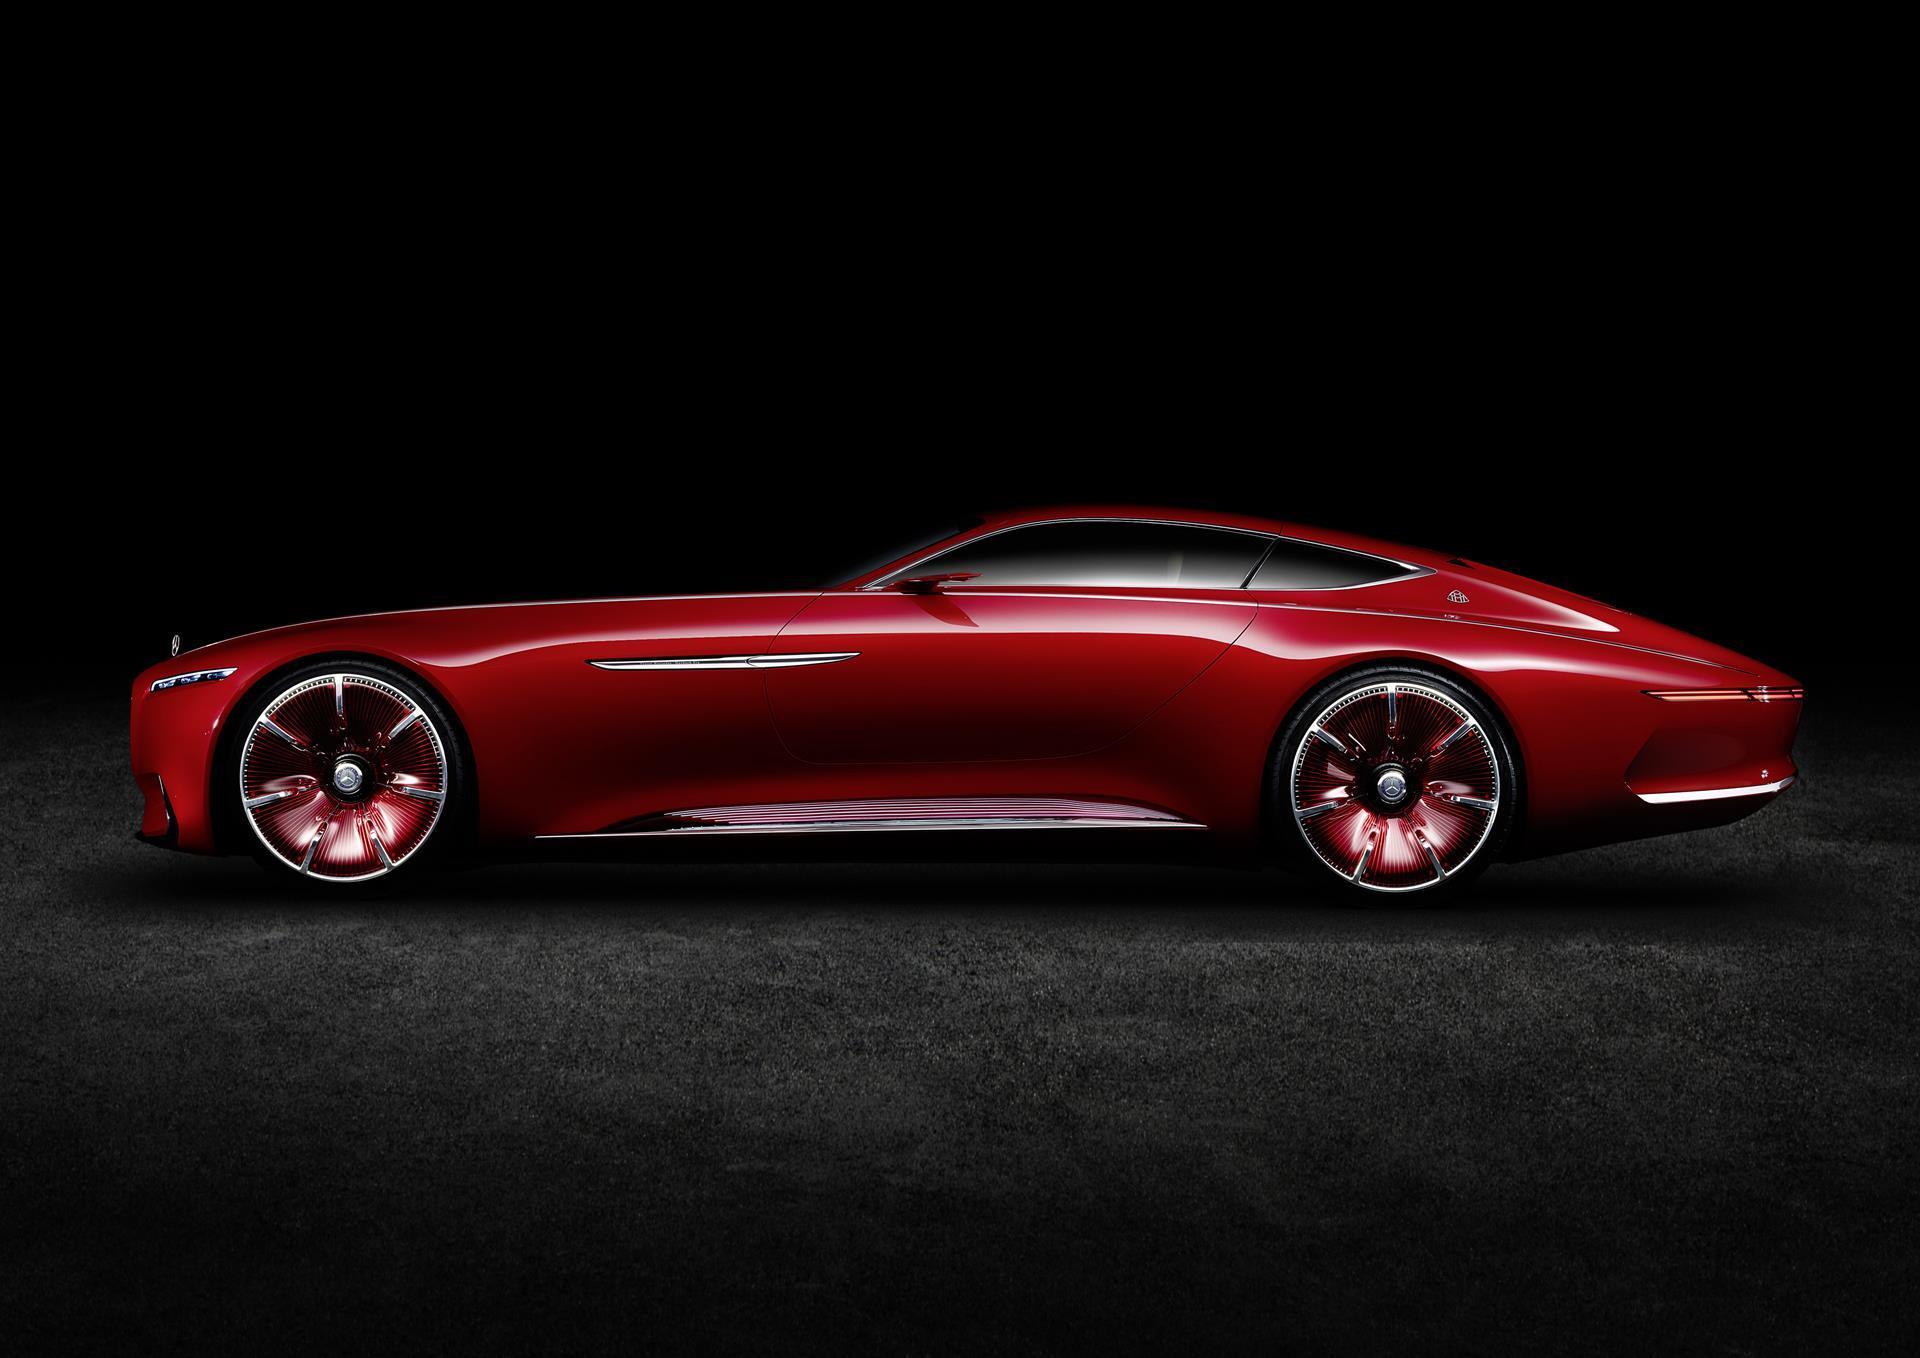 https://www.conceptcarz.com/images/Mercedes-Benz/Vision-Mercedes-Maybach-6-Concept-09.jpg